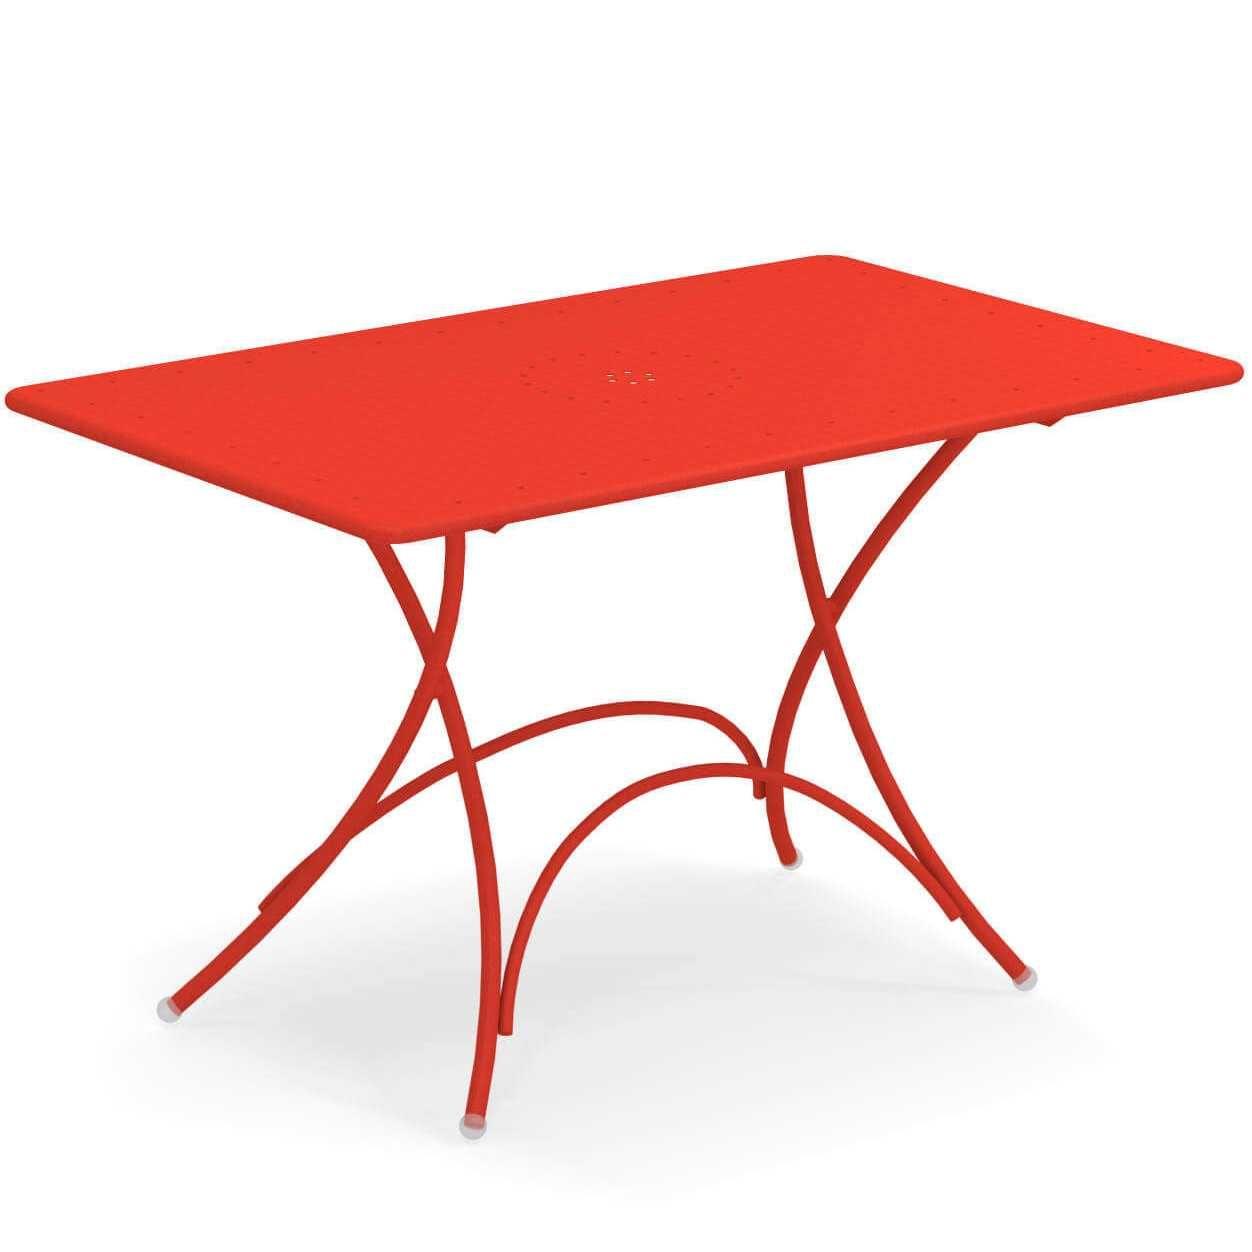 Emu Pigalle tuintafel 120×76 Scarlet Red